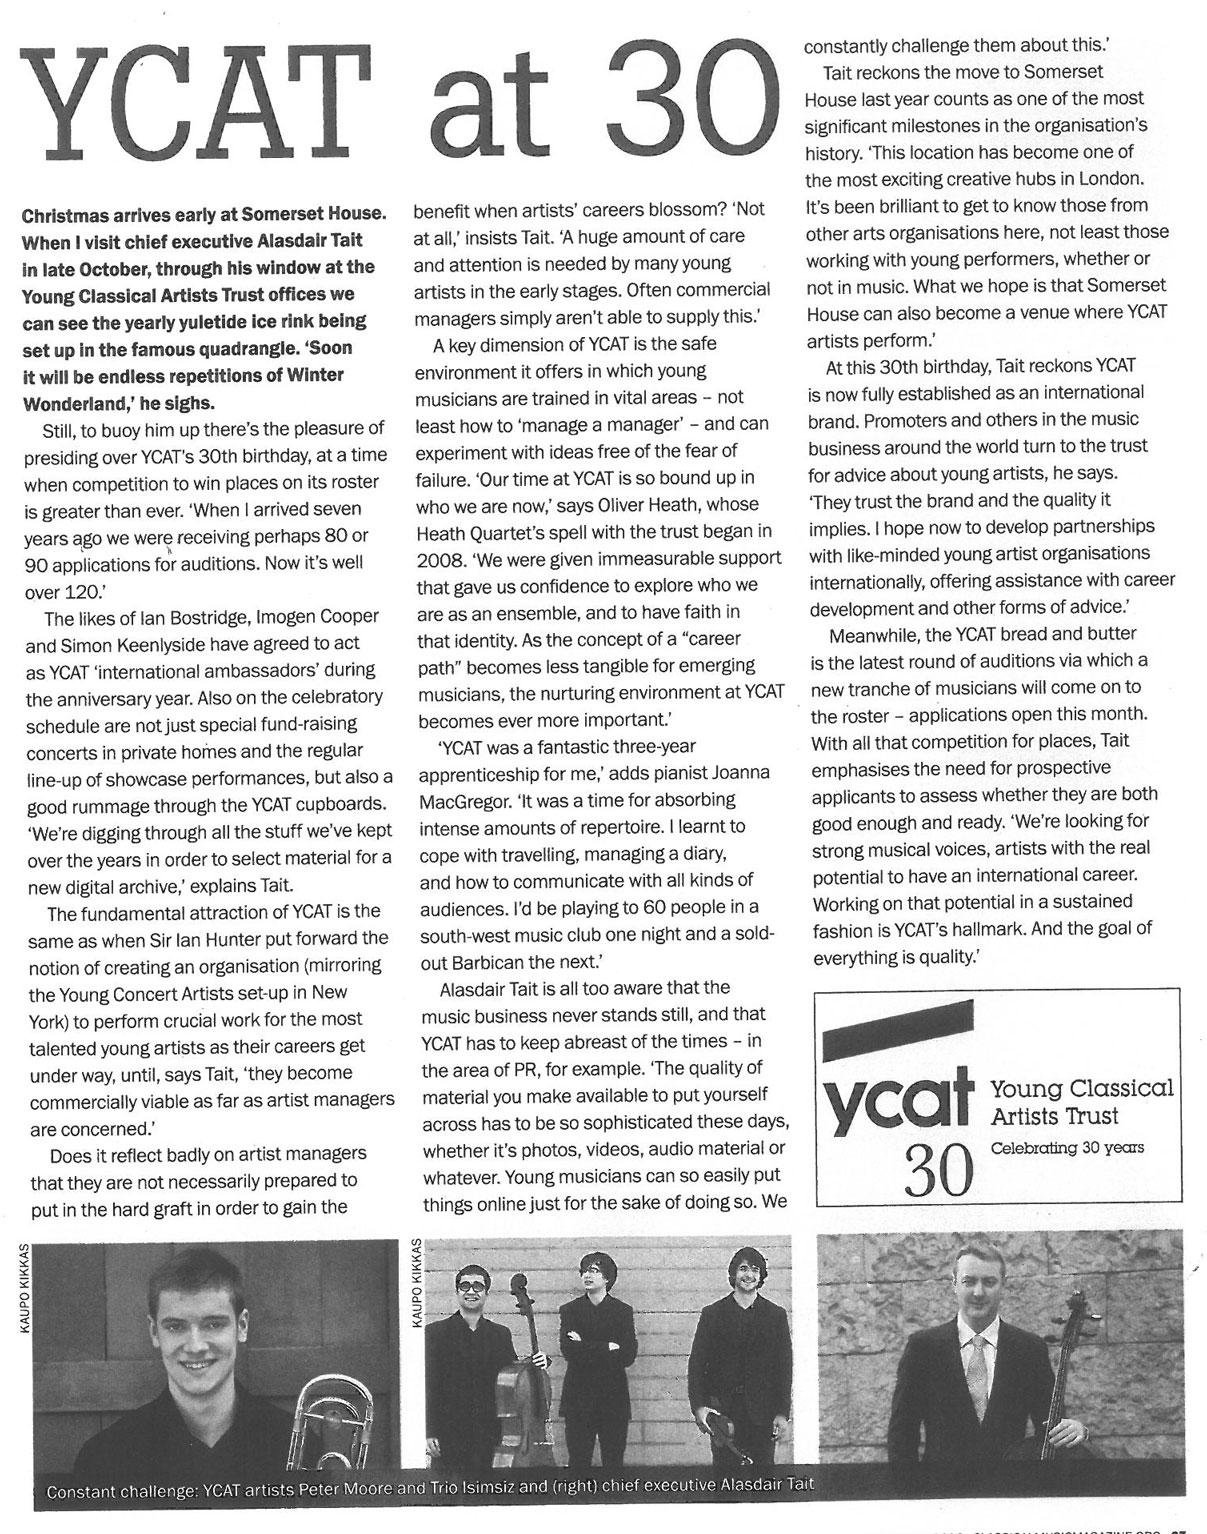 YCAT30 Feature, 2014, Classical Music